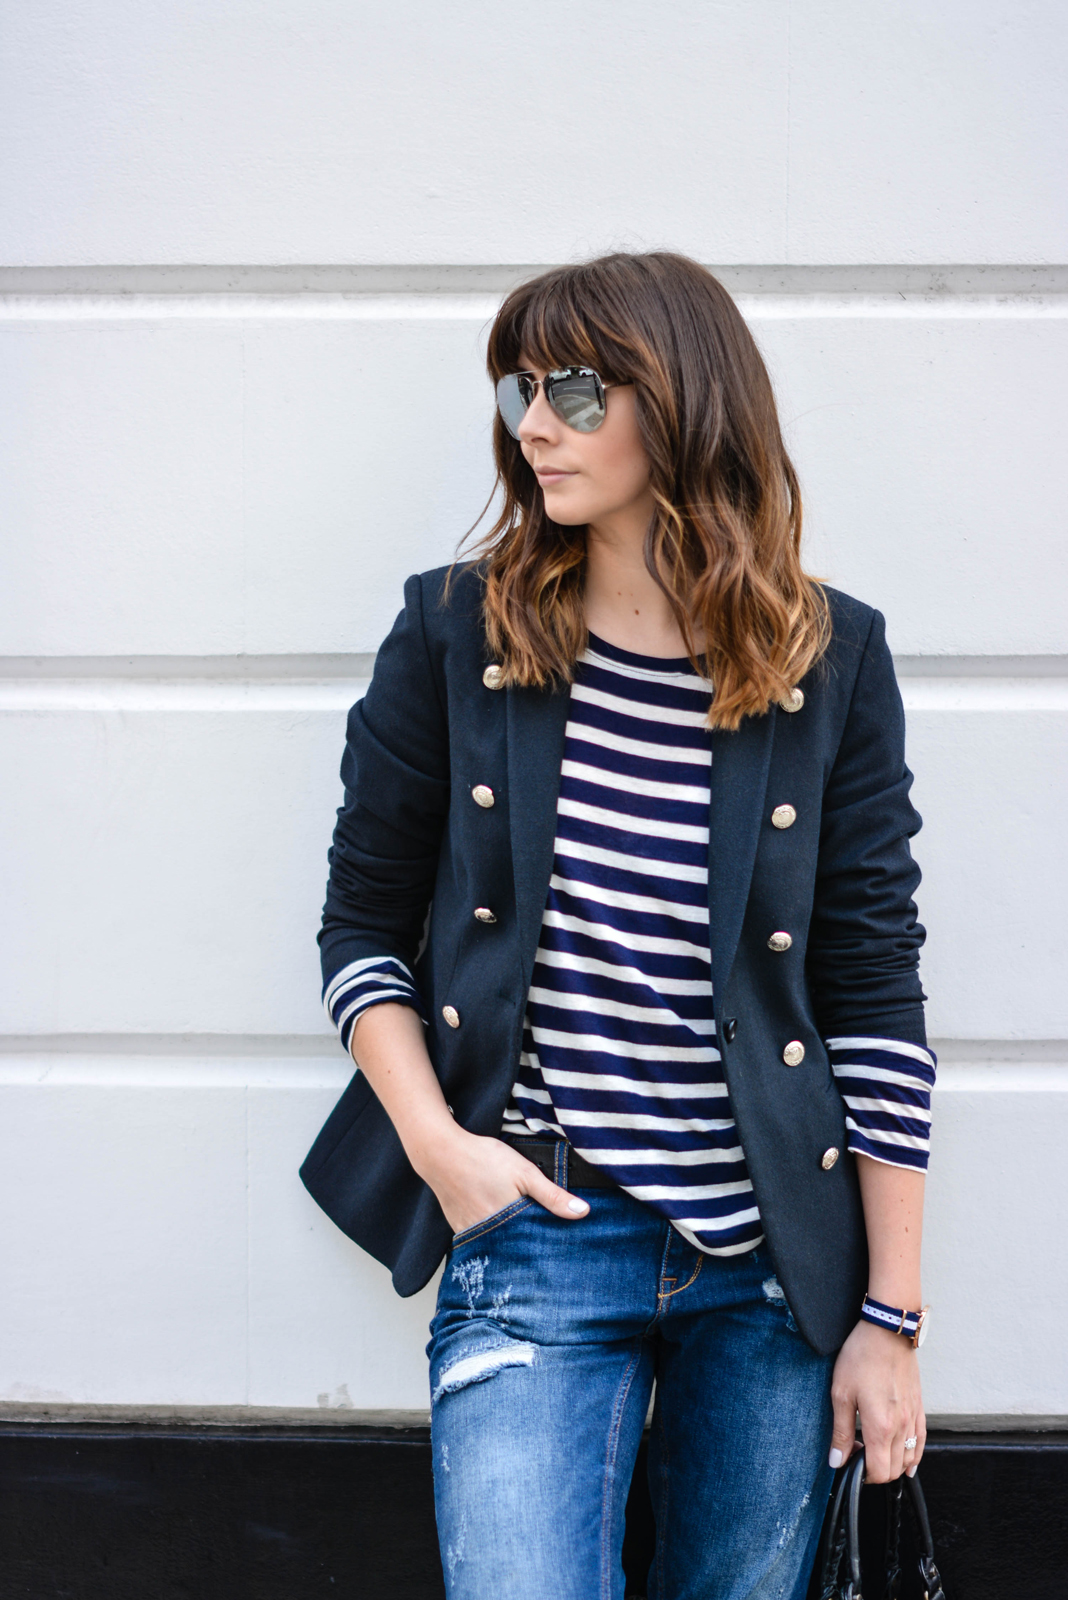 EJSTYLE - Emma Hill, Daniel Wellington Glasgow watch, breton stripe top tshirt, navy blazer, Ripped boyfriend jeans, mirror aviator sunglasses, street style